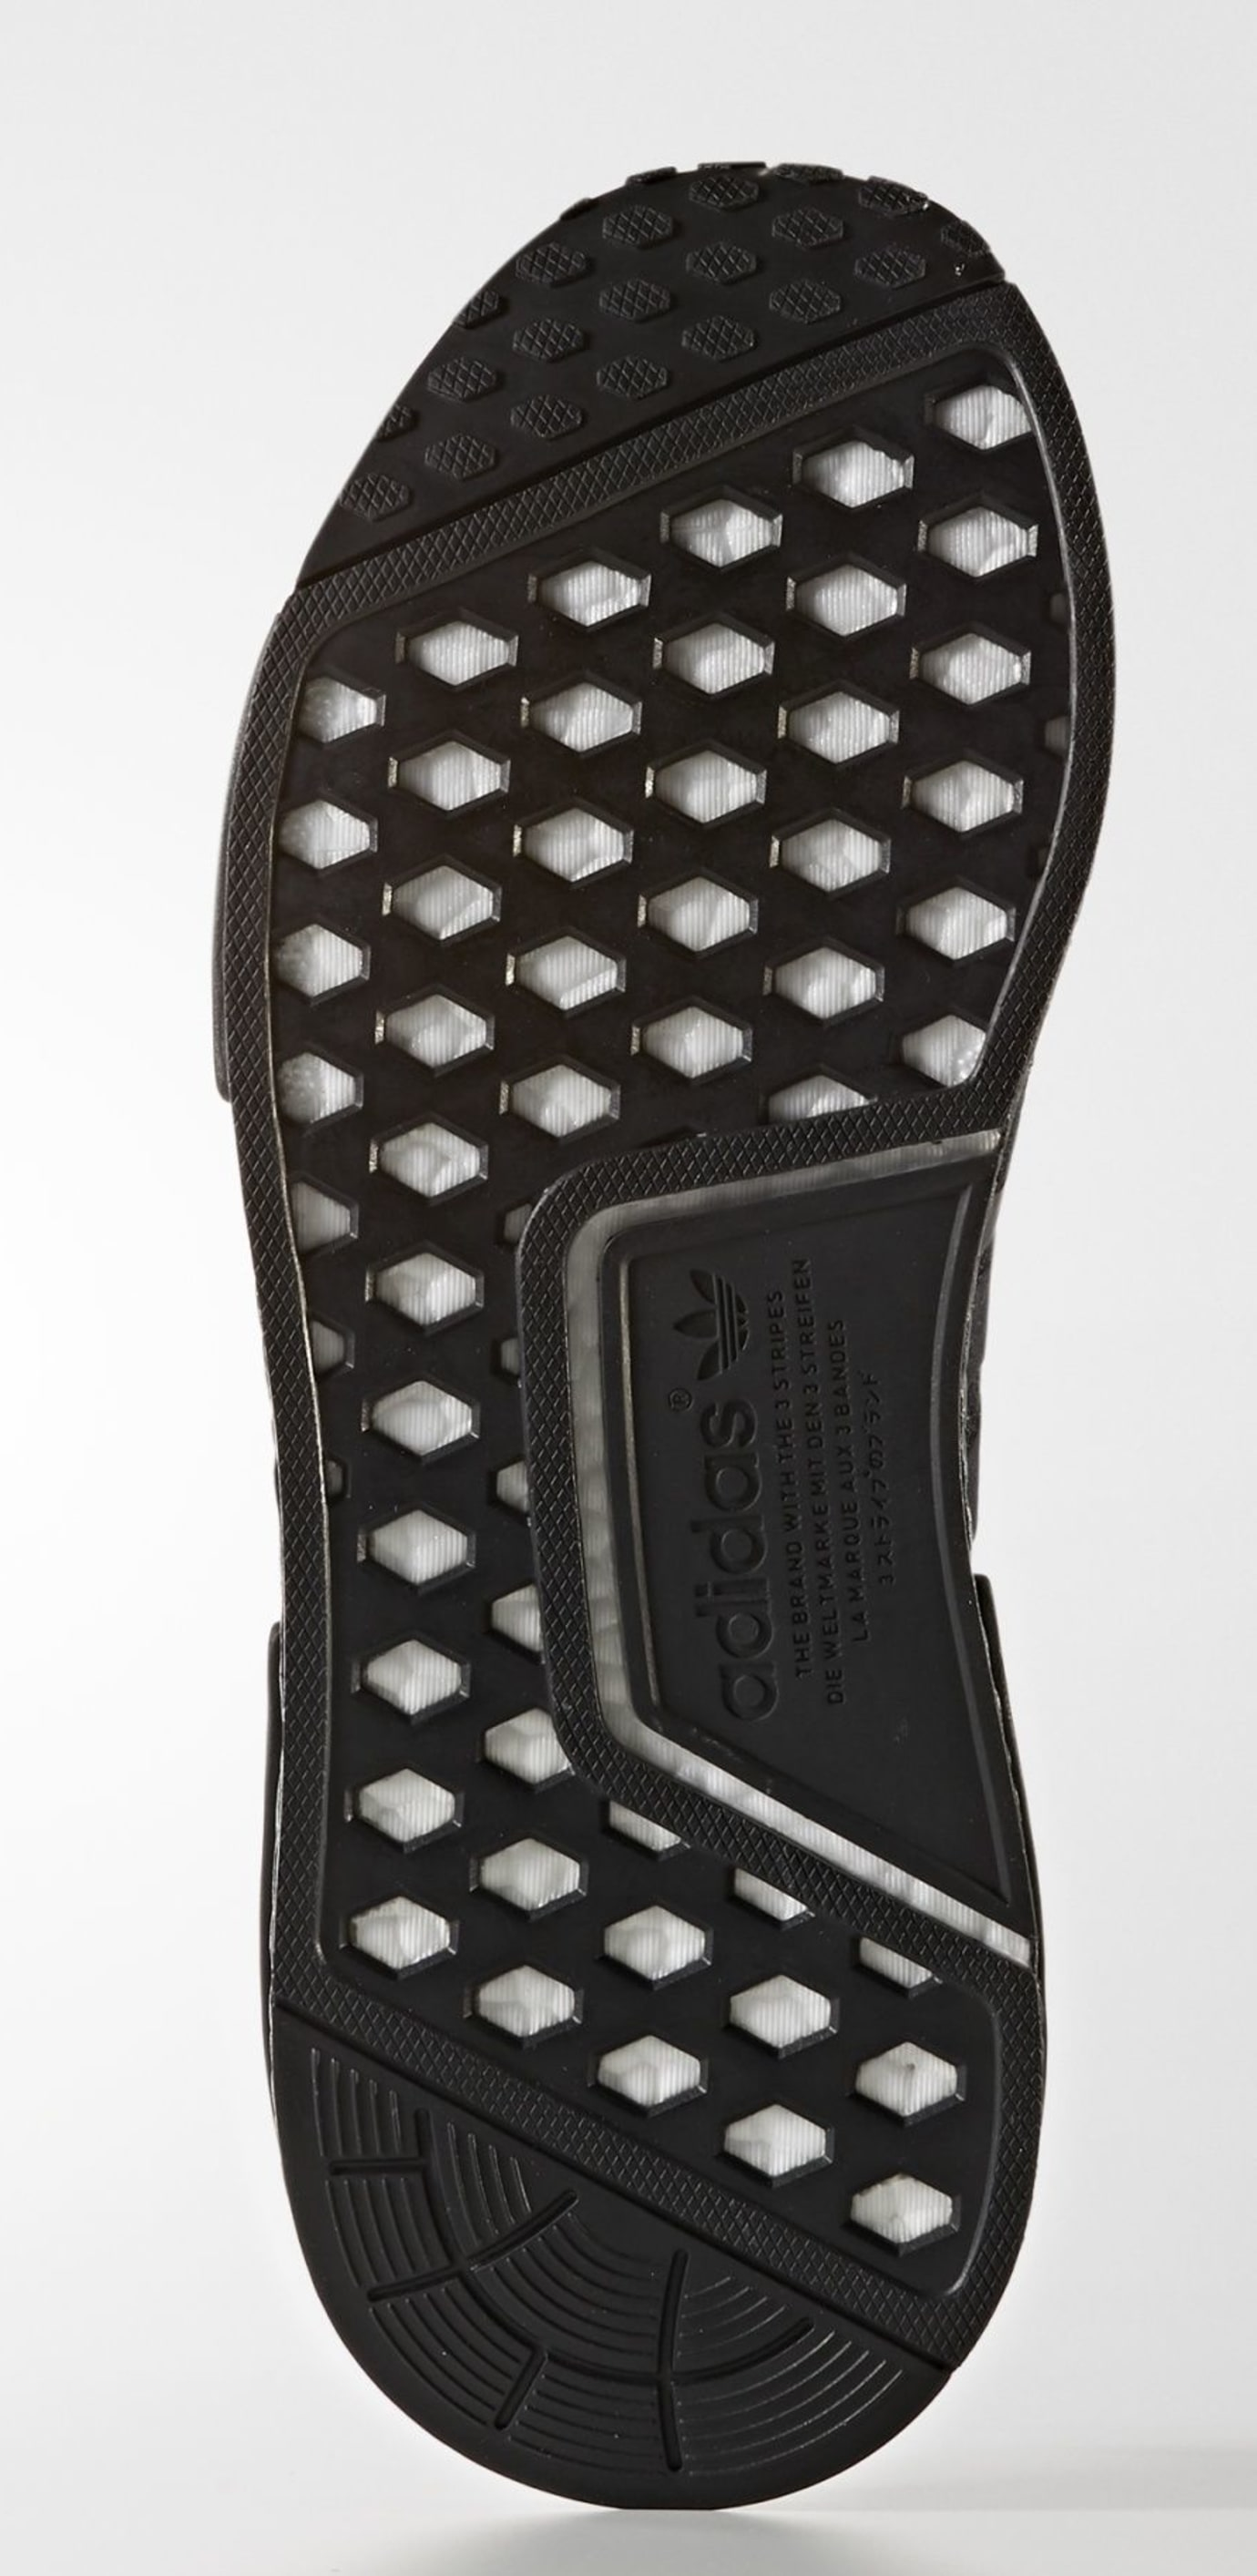 Adidas NMD_R1 PK 'Japan Pack' BZ0220 (Bottom)